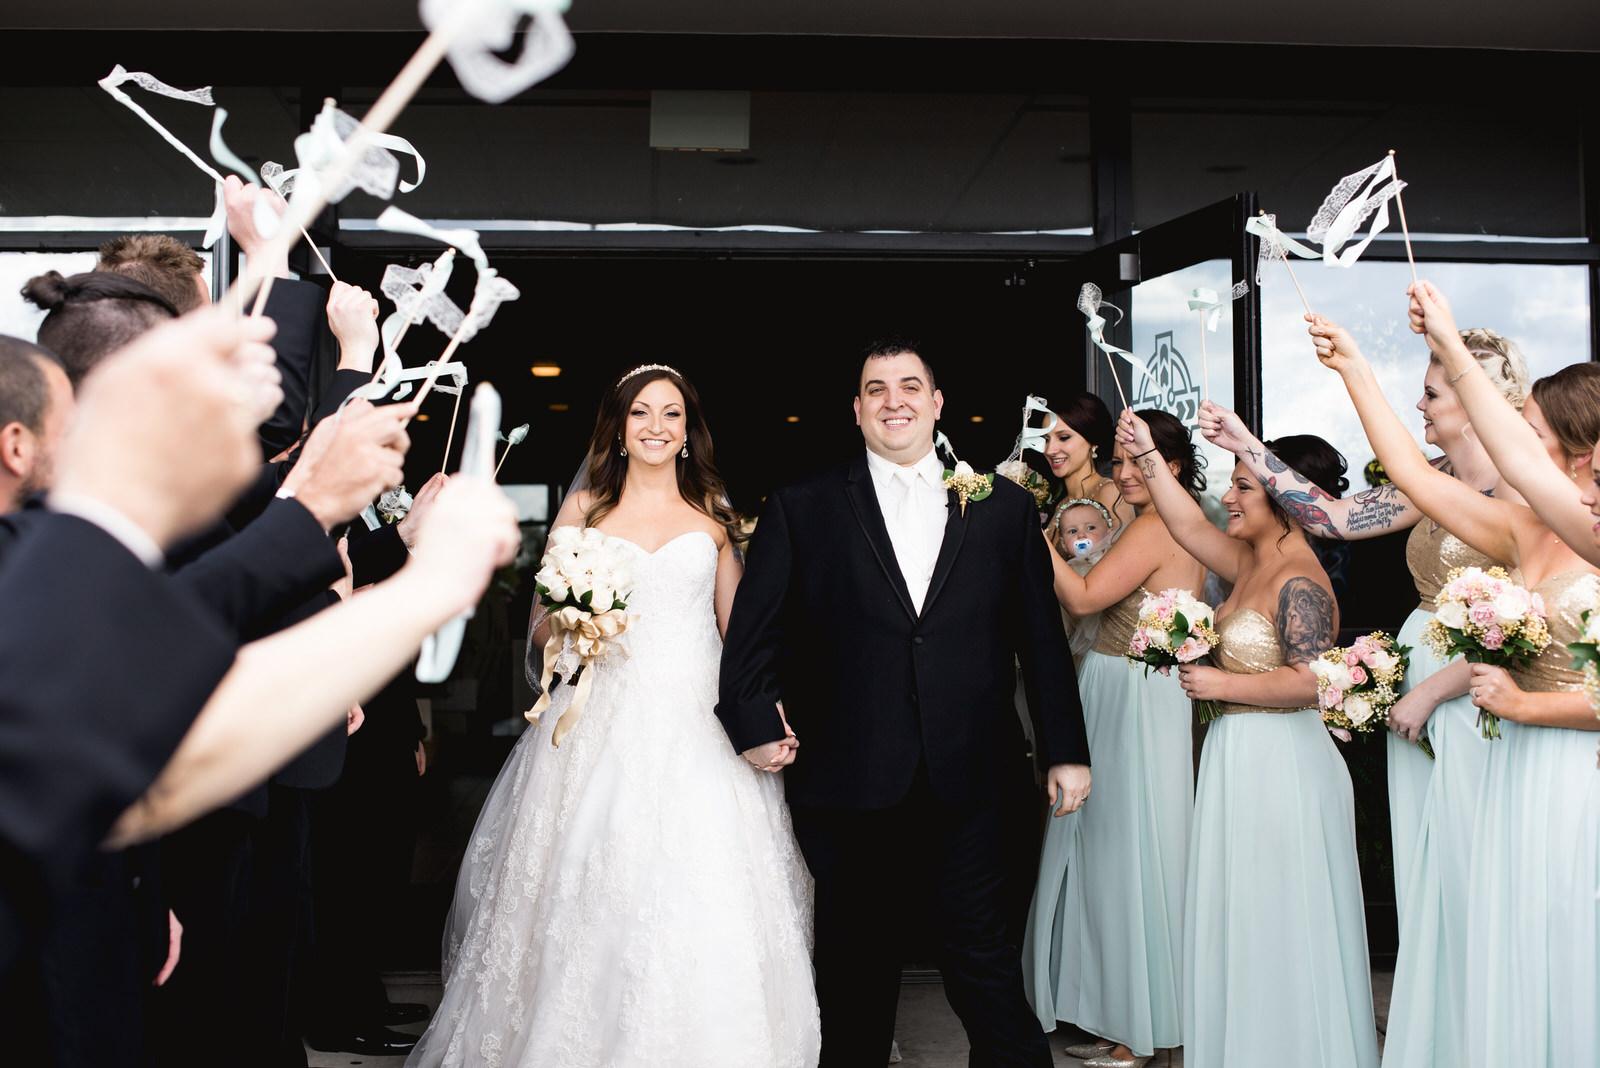 Laube_Banquet_Hall__Wedding_Photos_009.jpg